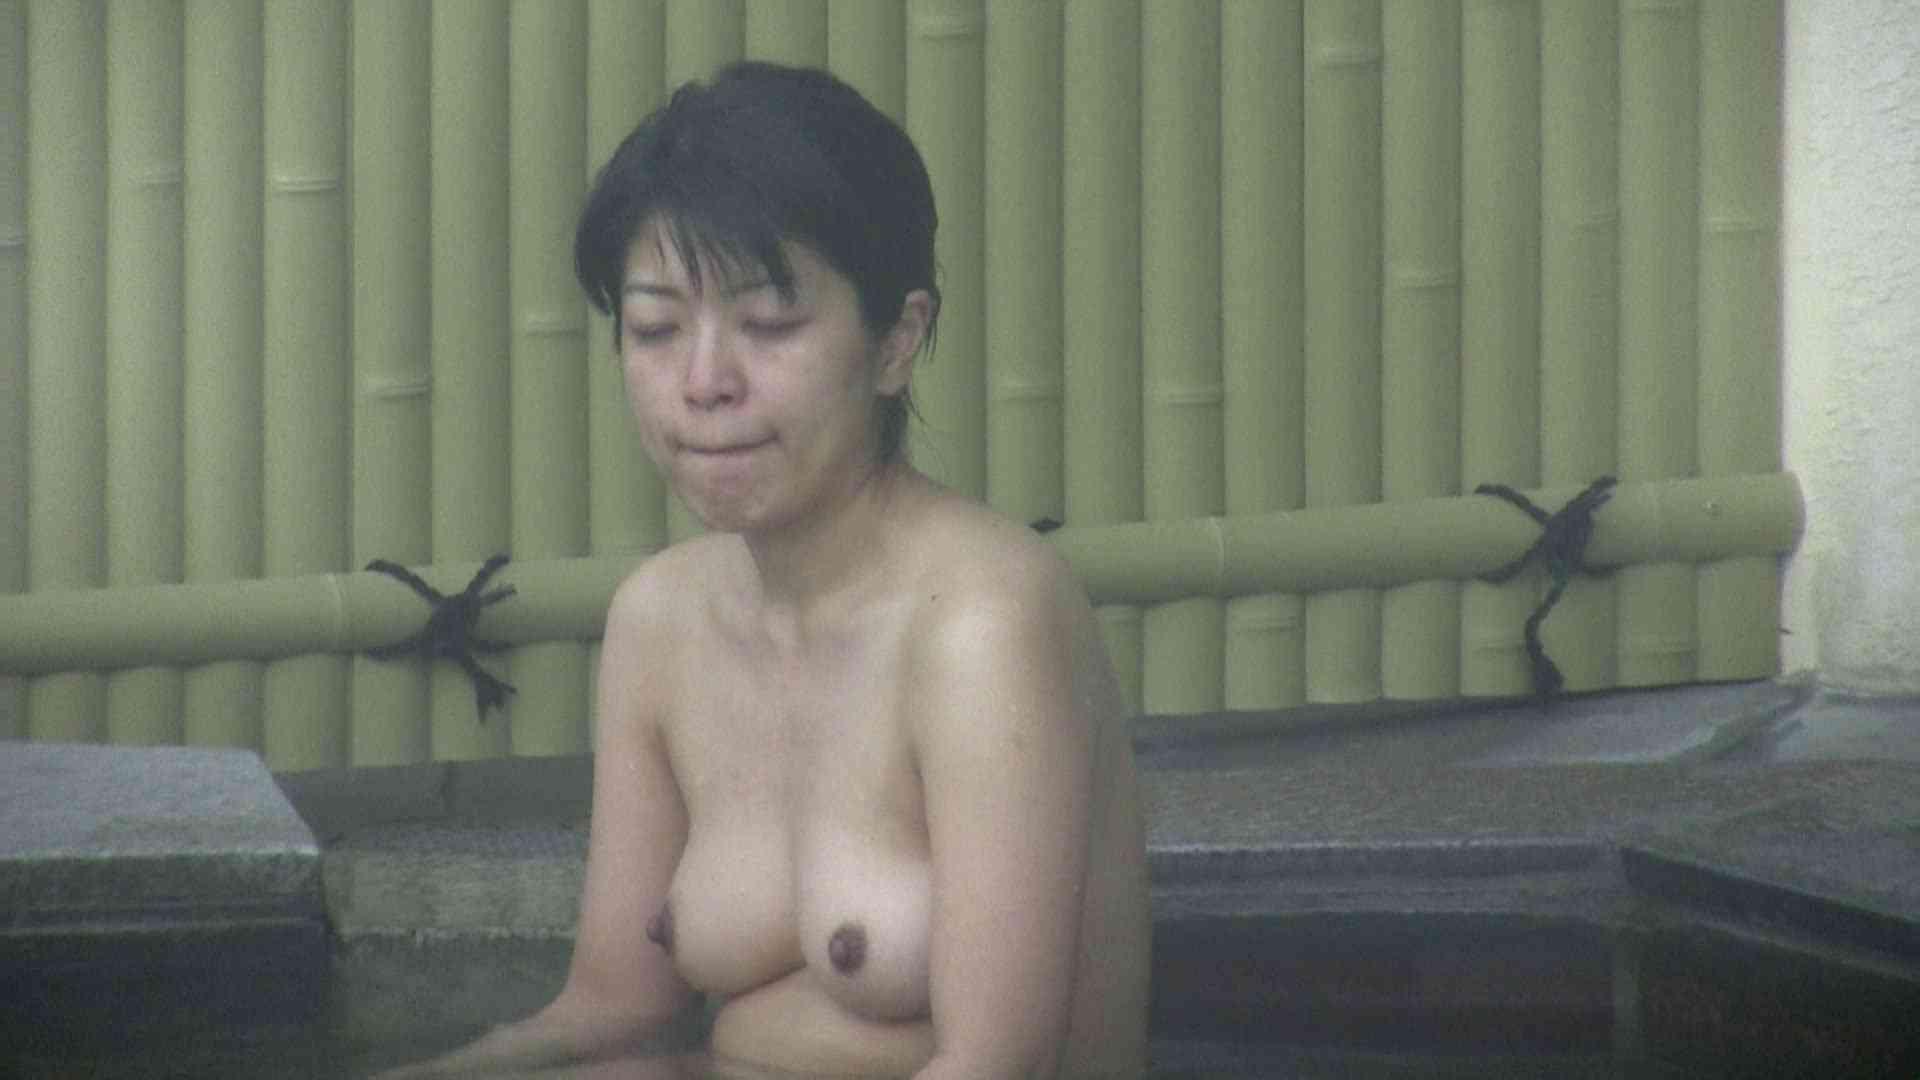 Aquaな露天風呂Vol.585 盗撮   OLセックス  51画像 22